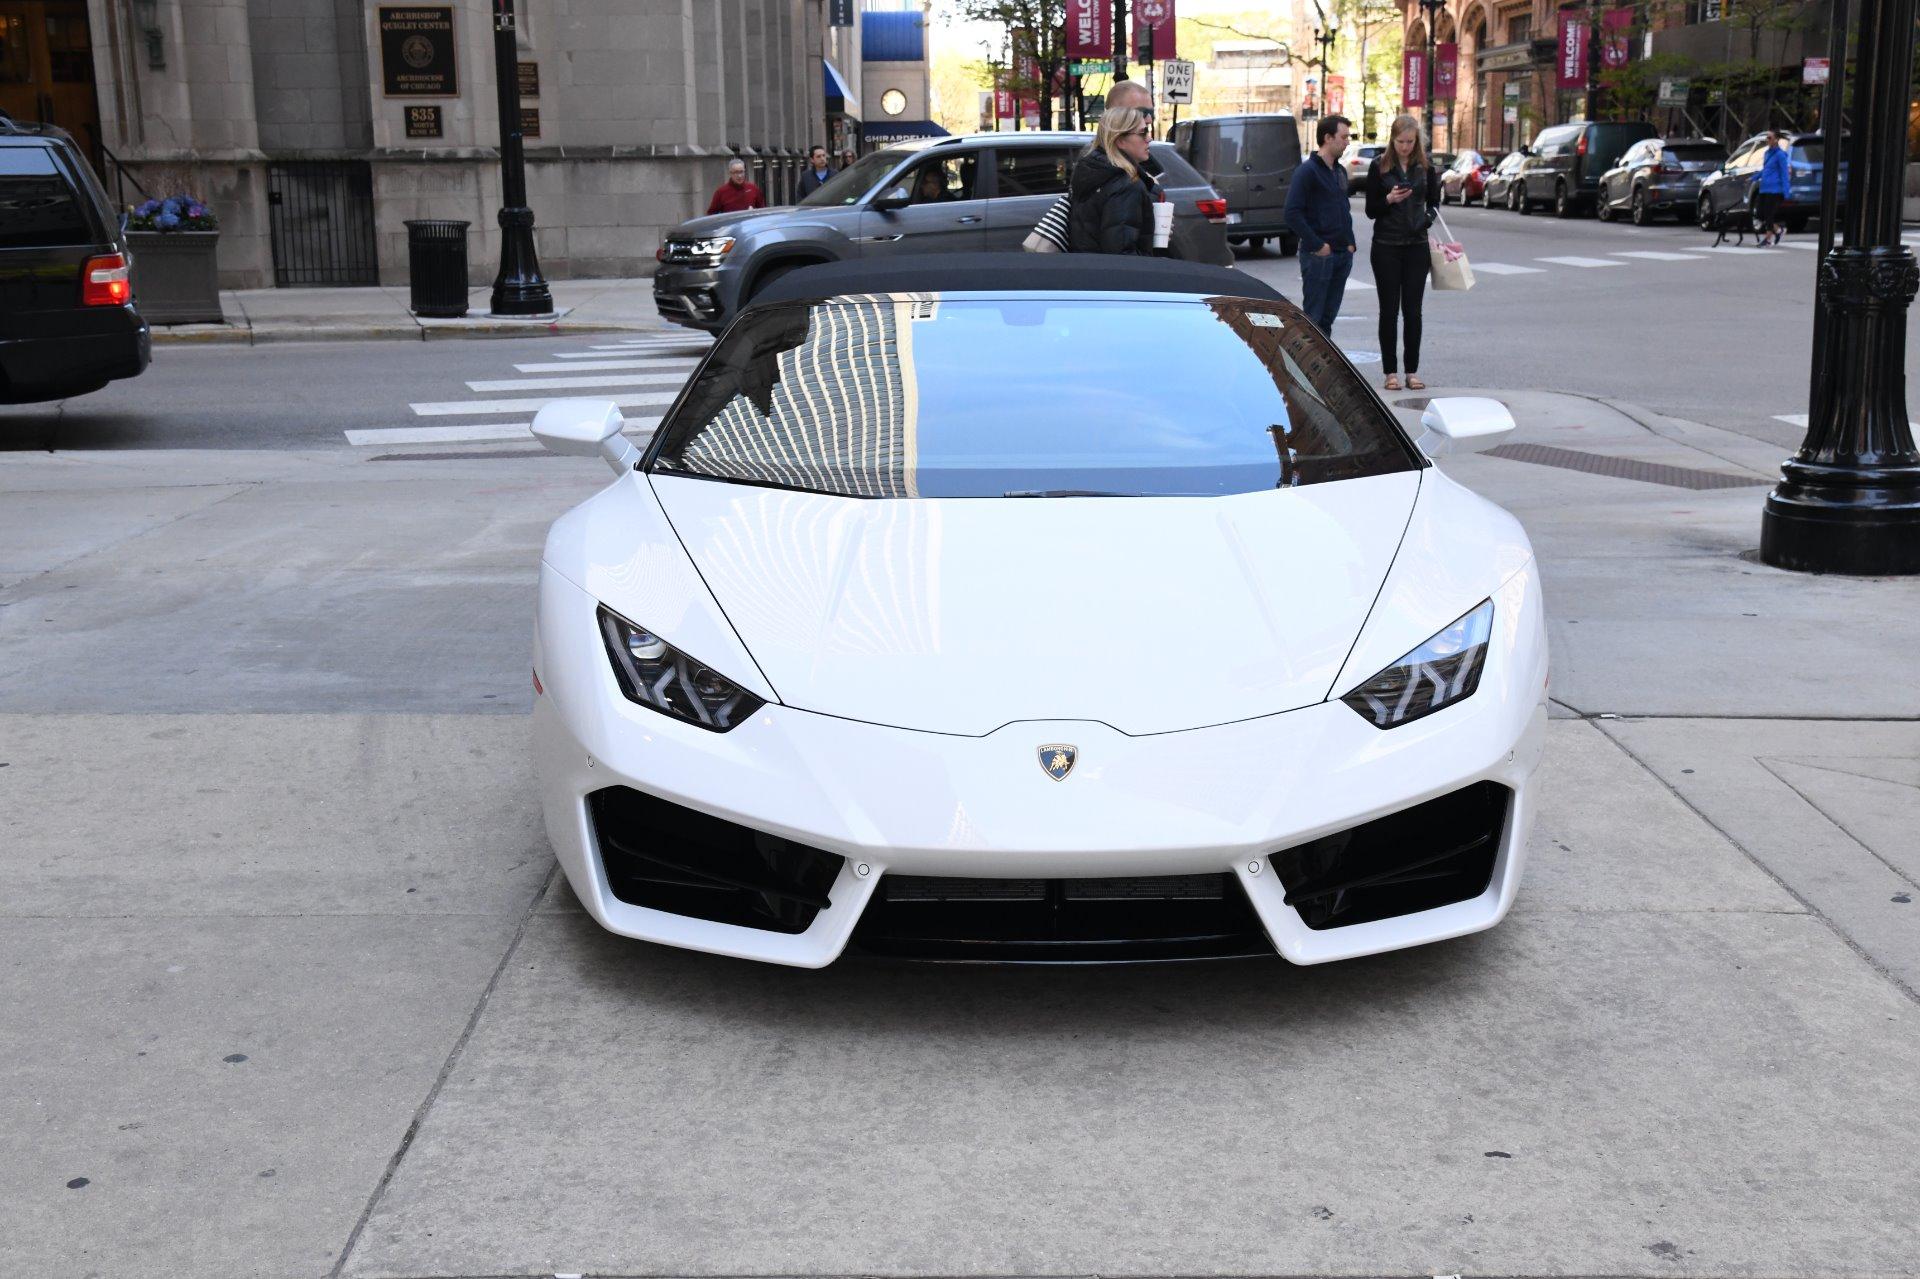 New 2019 Lamborghini Huracan Spyder LP 580-2 Spyder | Chicago, IL